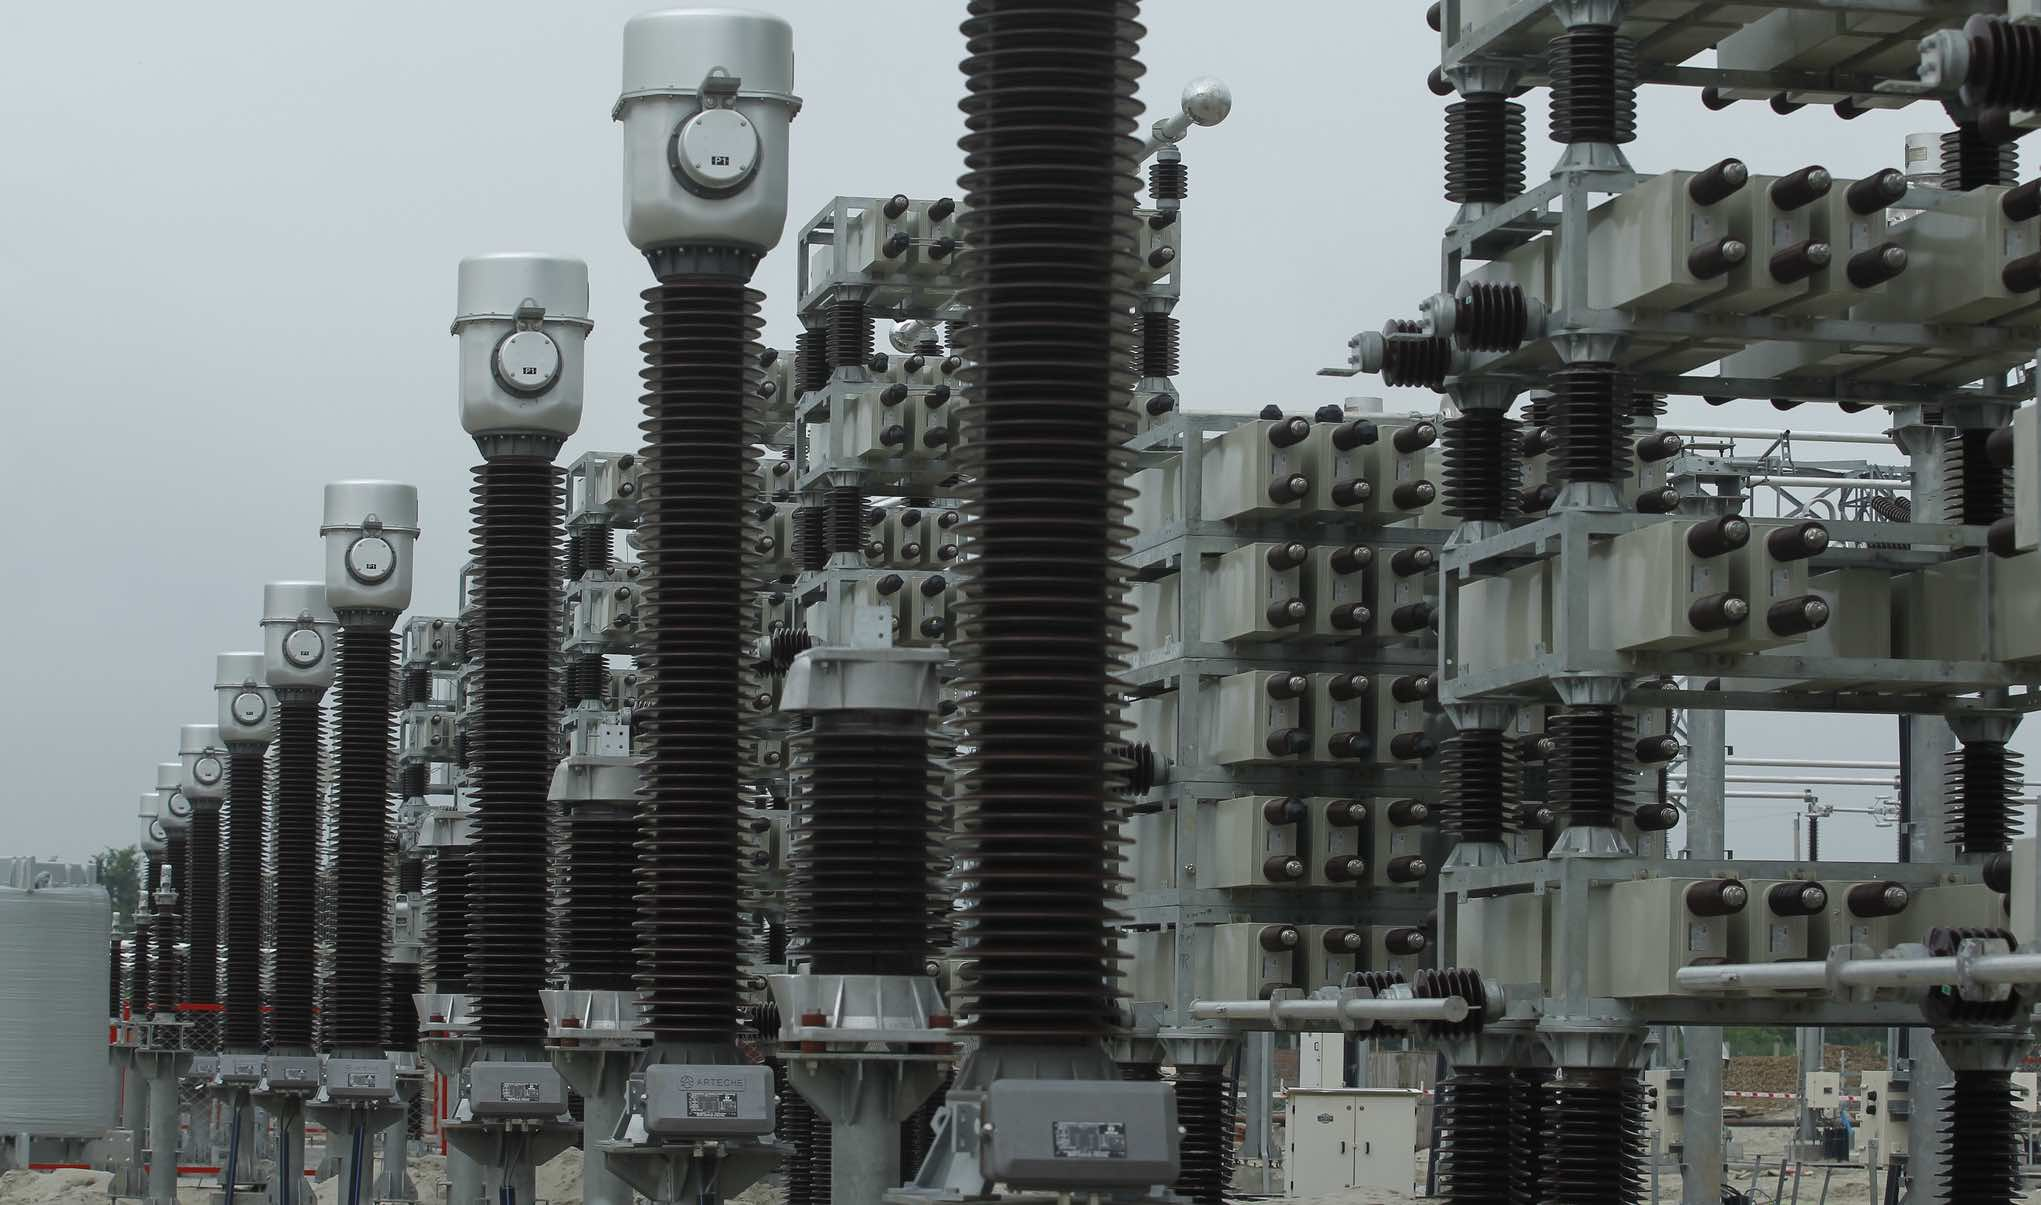 Electricity pylons in Bangladesh (Photo: Asian Development Bank/Flickr)